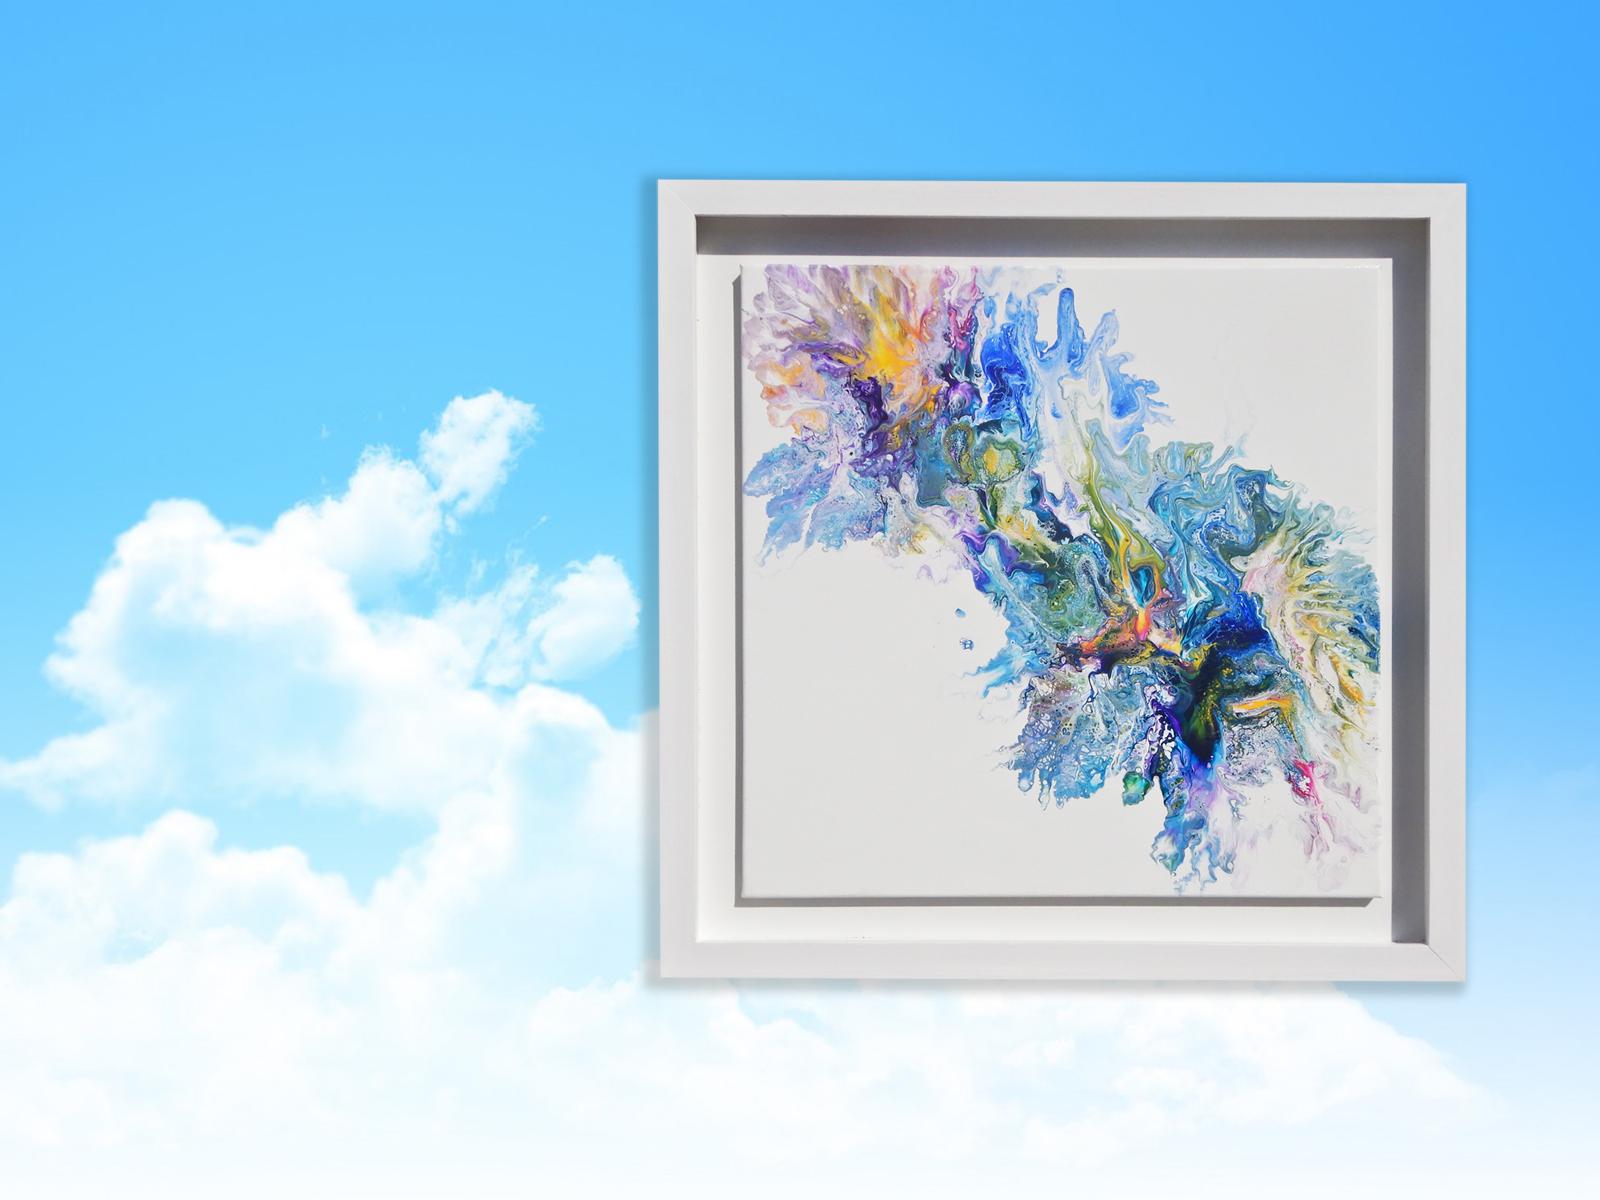 Aqua-Dynamics-part-2 JohnBrady Art